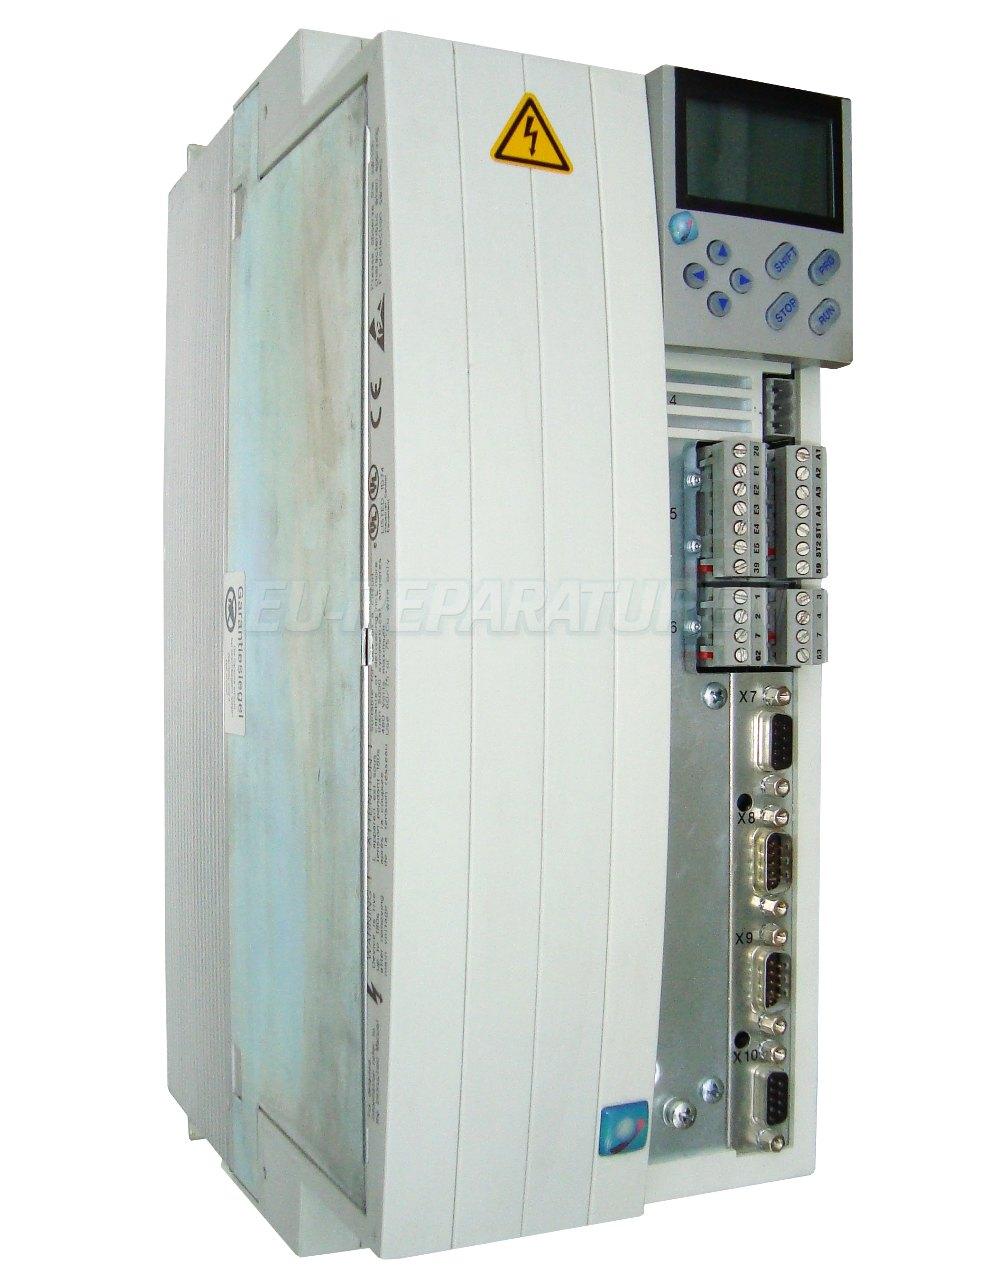 SERVICE LENZE EVS9326-ER AC DRIVE